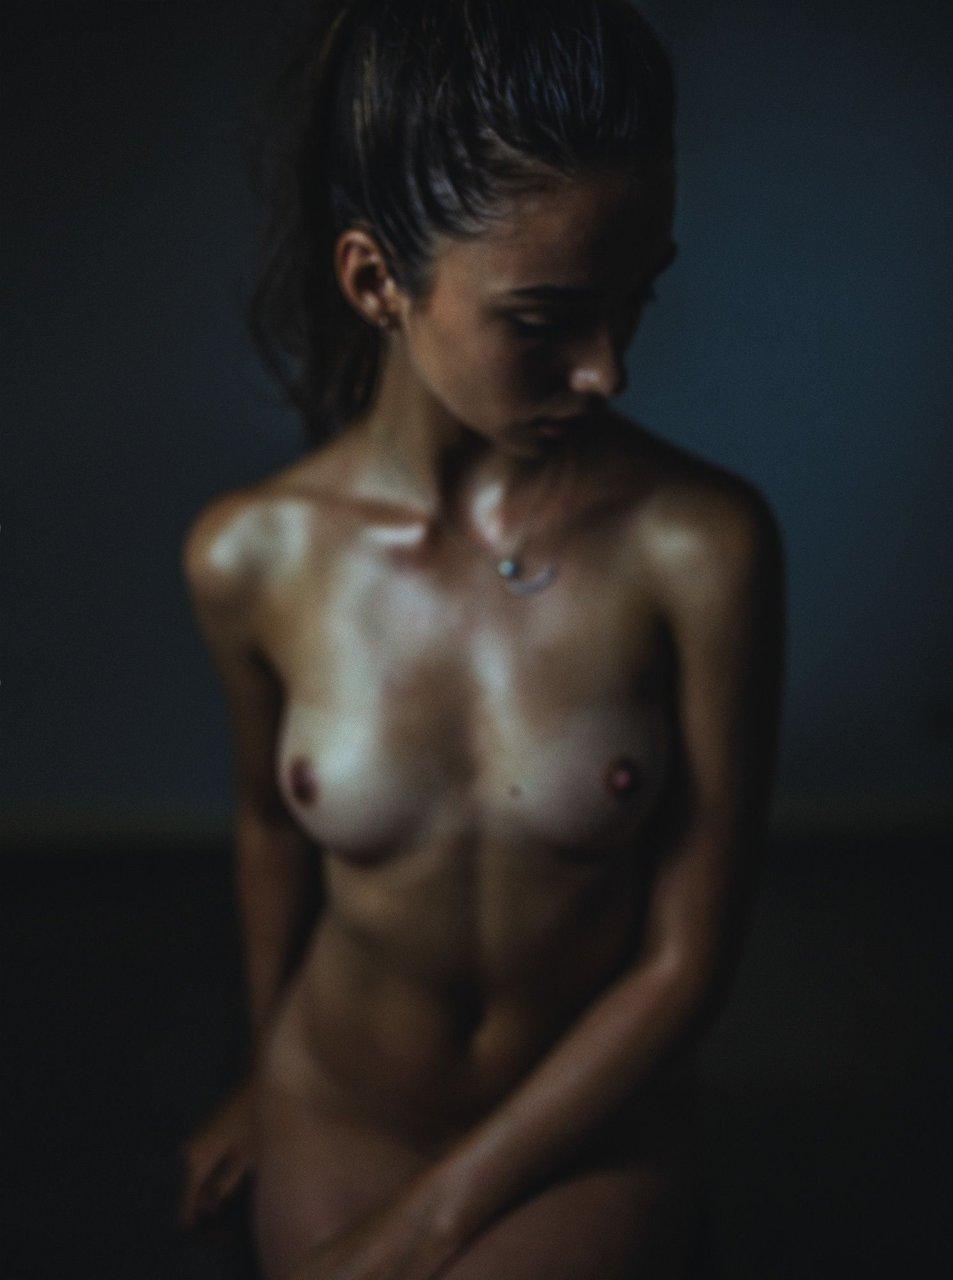 nudes (84 photo), Is a cute Celebrites pics